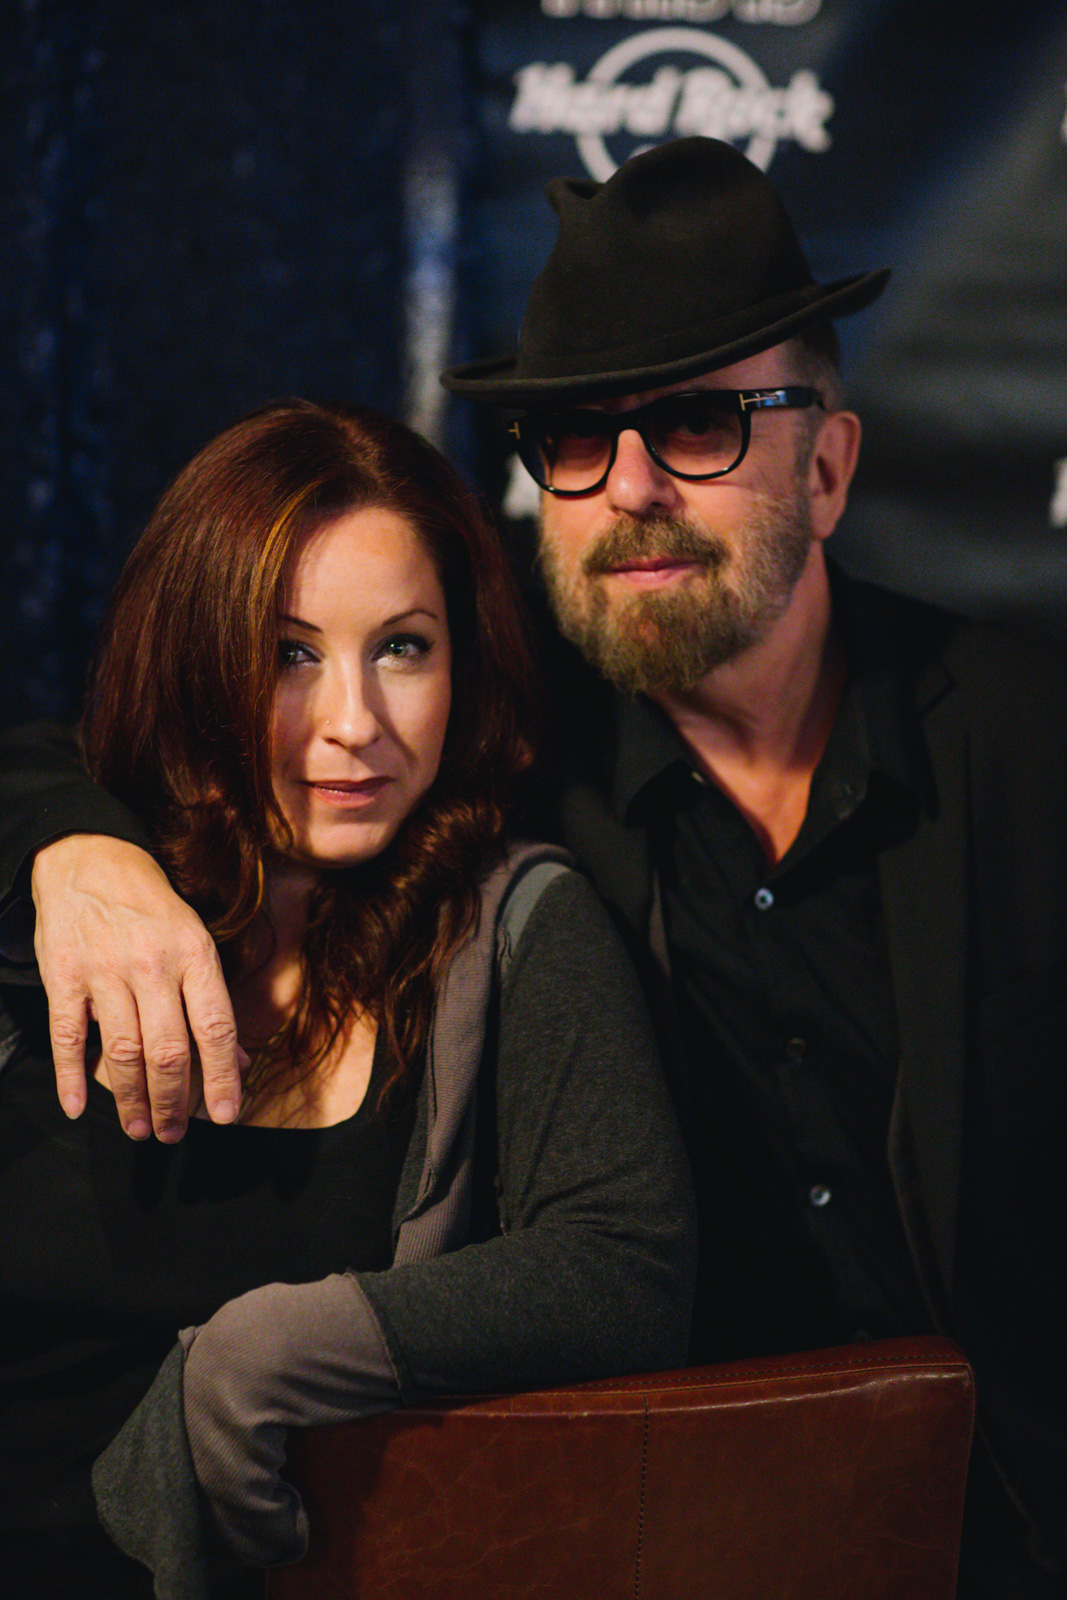 Dawn Garcia and David Stewart of the Eurythmics